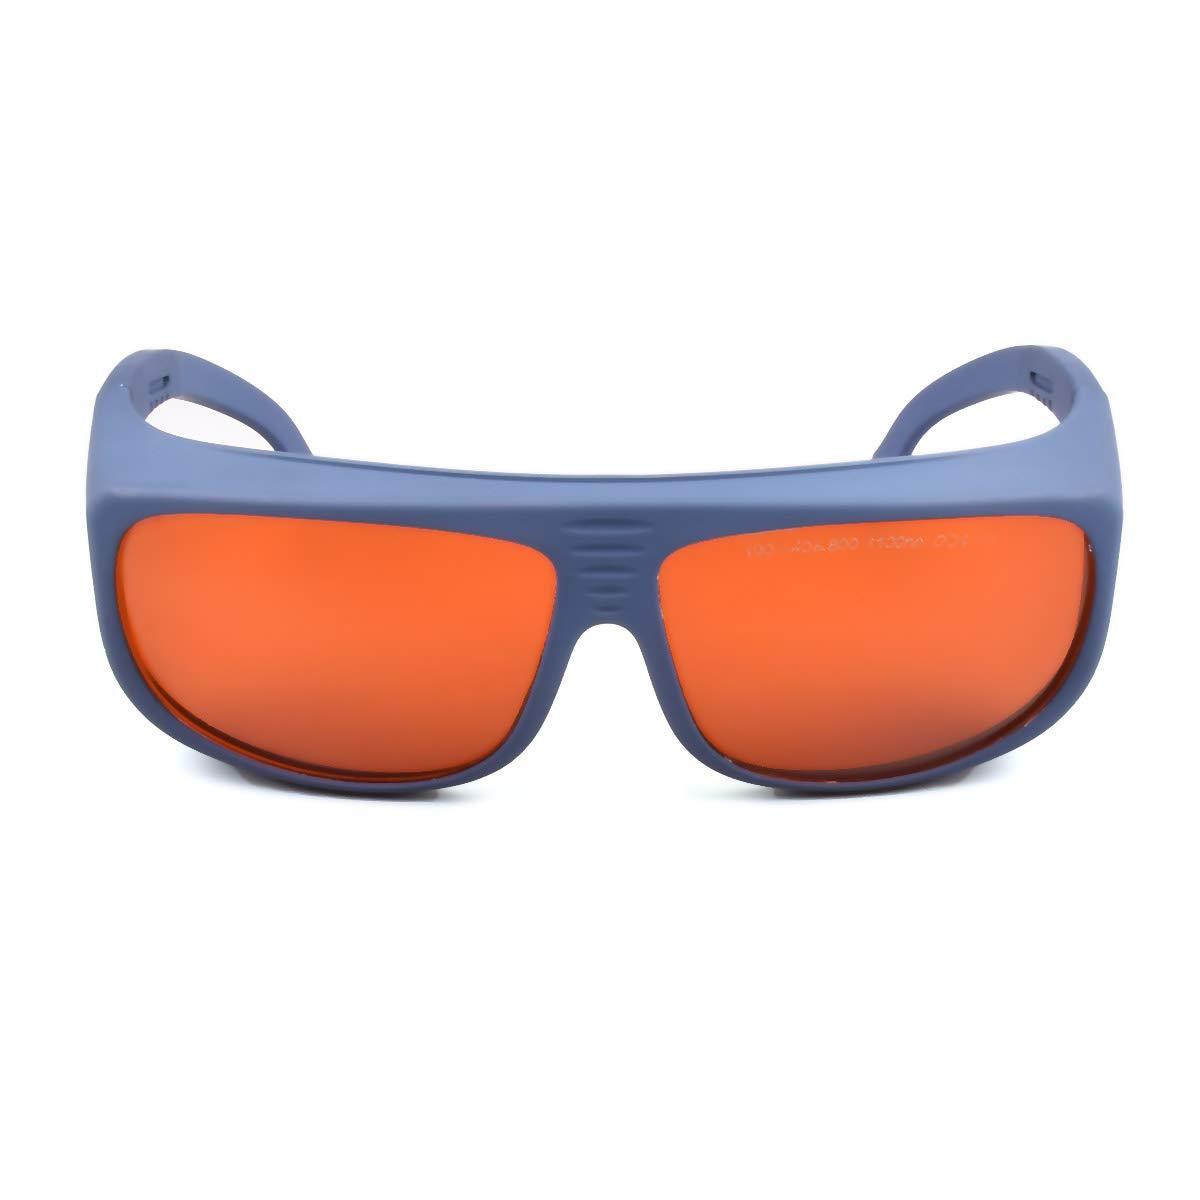 OD 6+ 190nm-550nm / 800nm-1100nm Wavelength Professional Laser Safety Glasses for 405nm, 450nm, 532nm, 808nm,980nm,1064nm, 1080nm, 1100nm Laser (Style 5) by FreeMascot